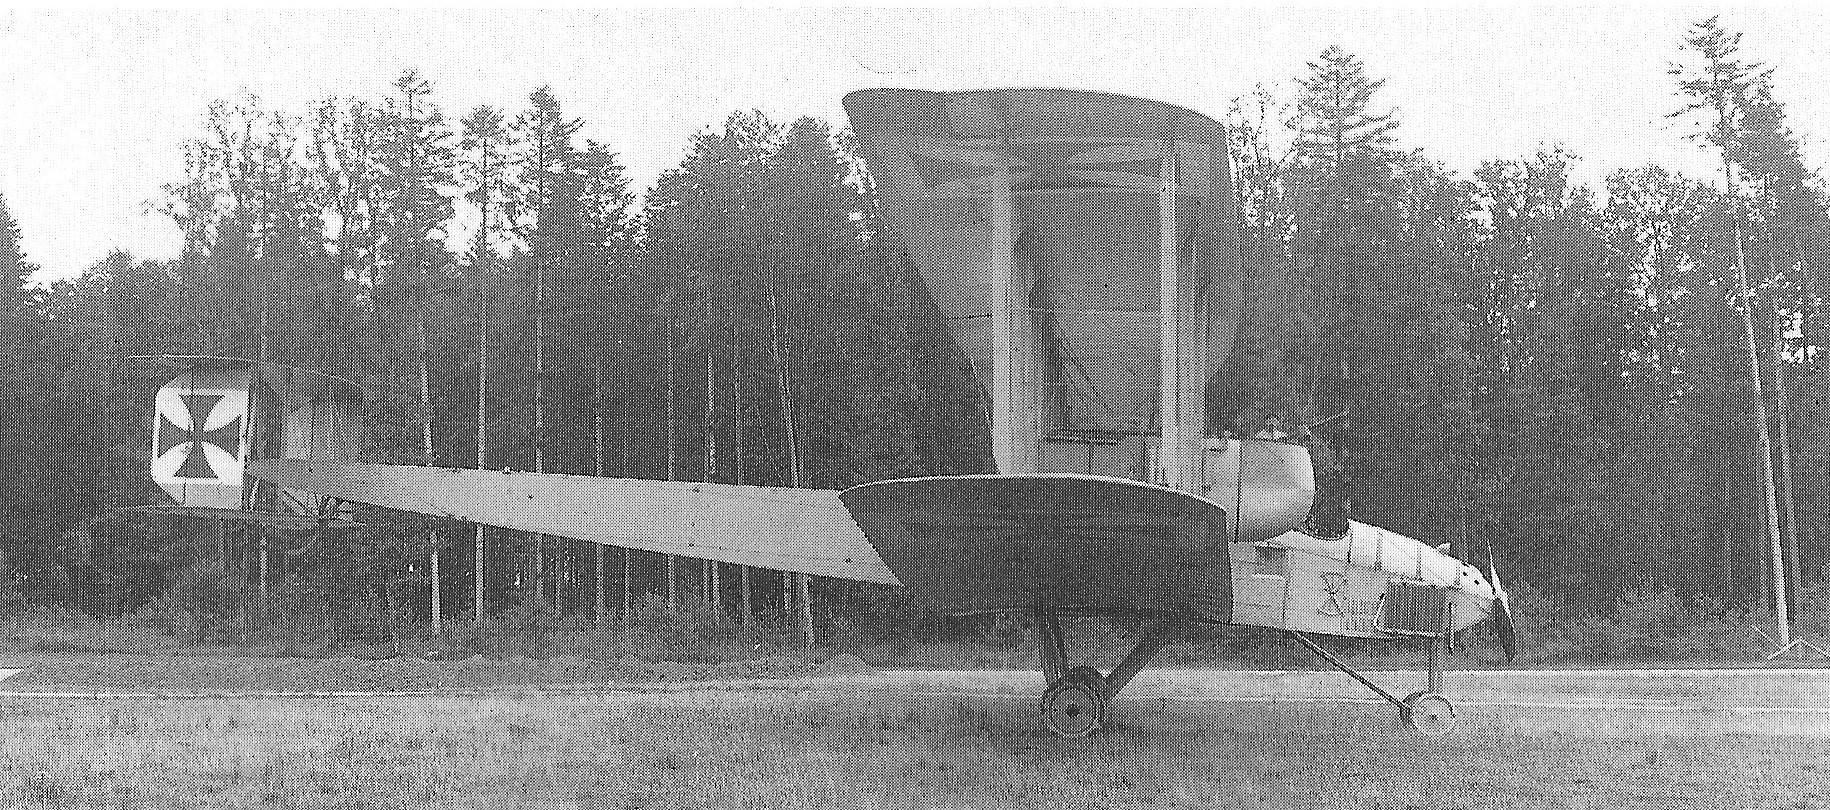 VGO 1 with new nacelles